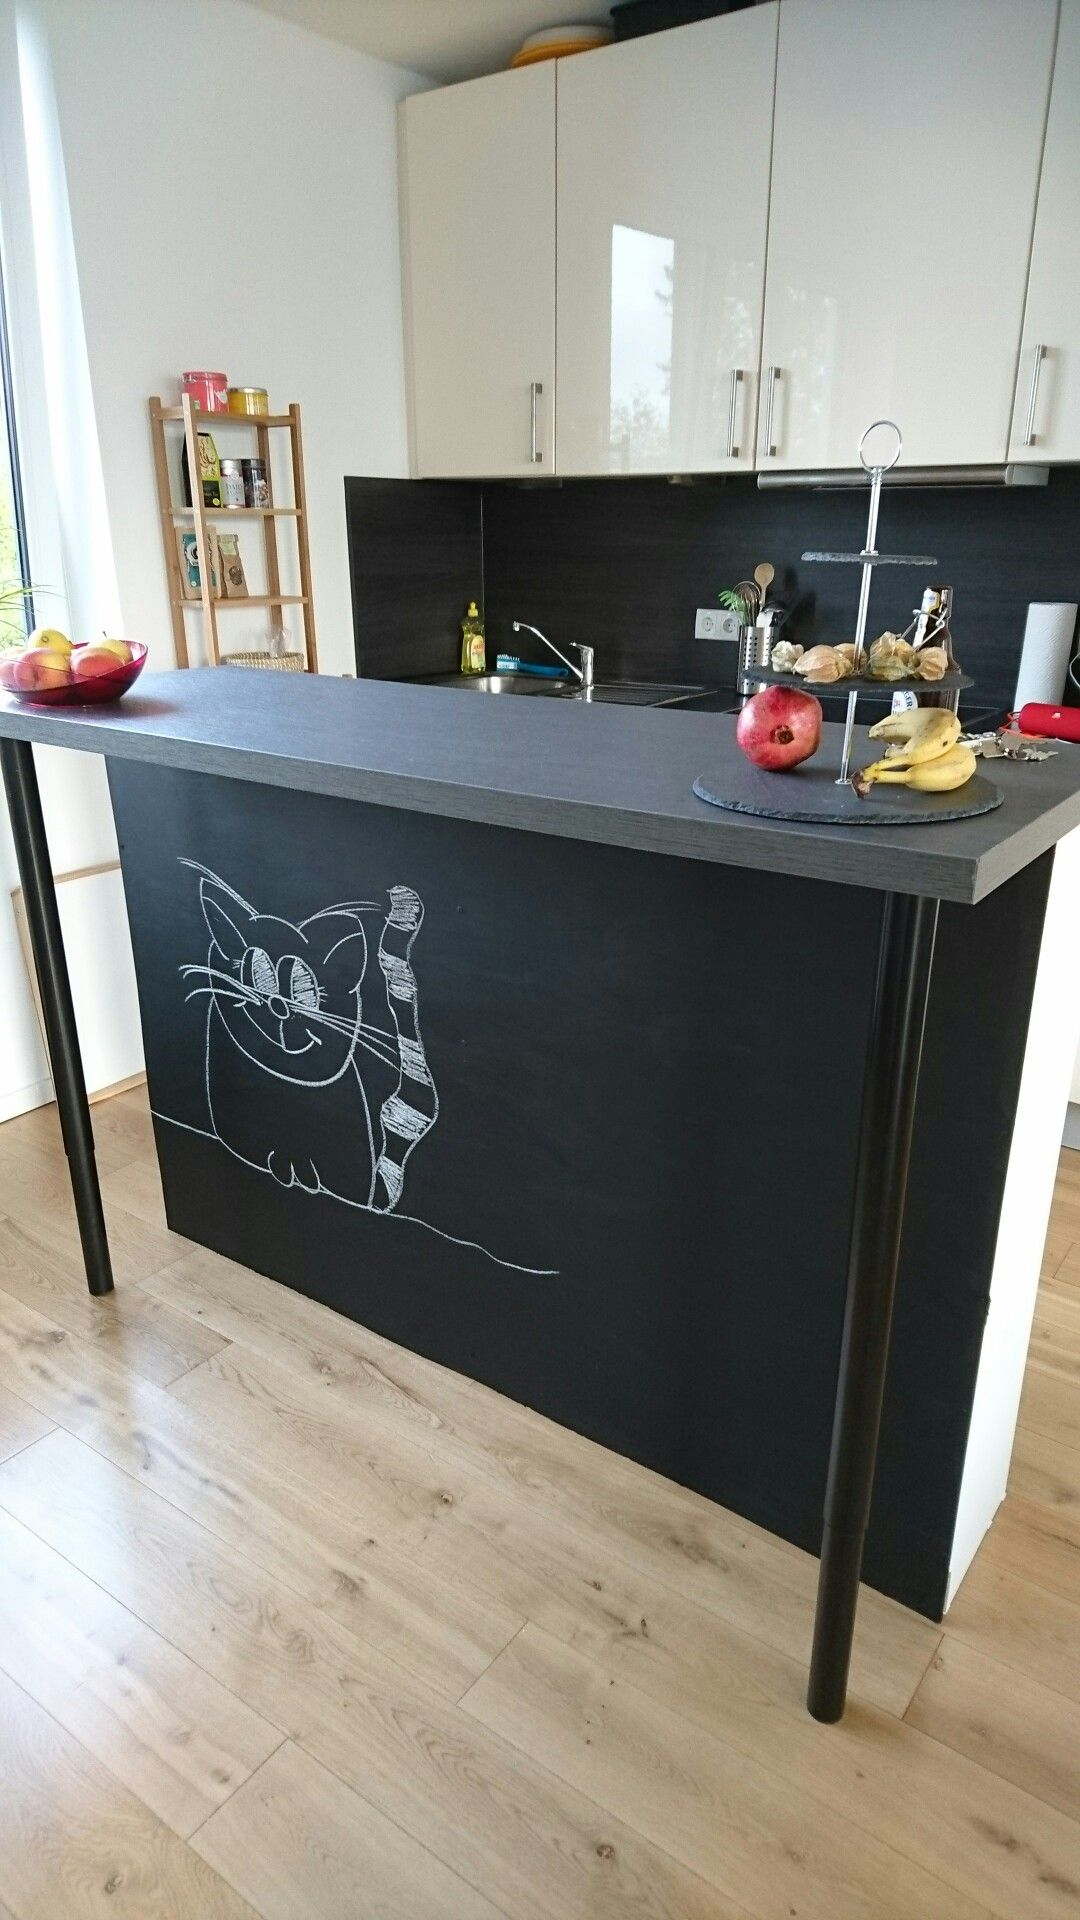 Groß Kücheninsel Ideen Ikea Uk Bilder - Küchenschrank Ideen ...